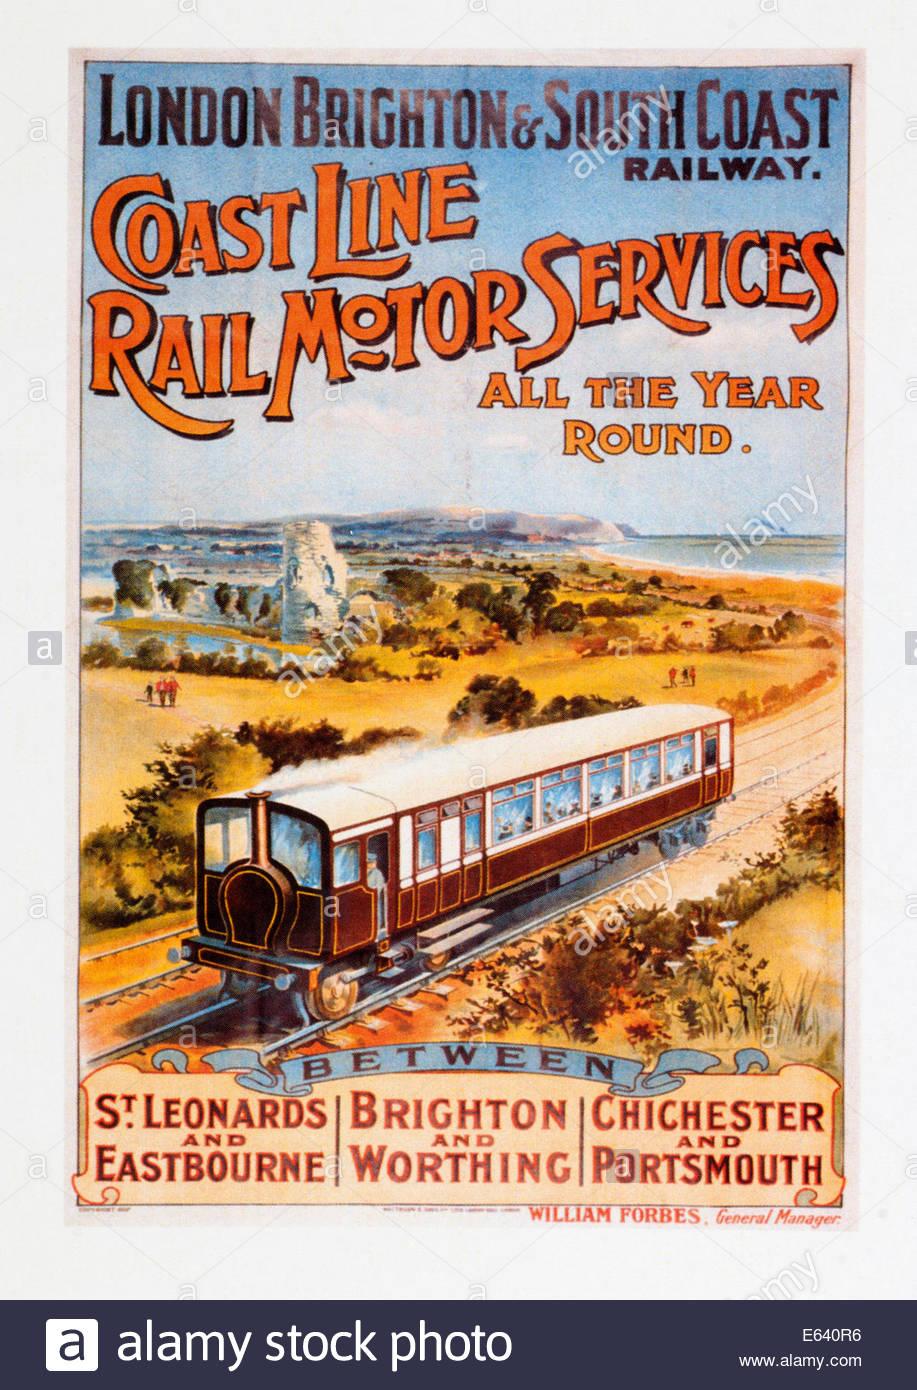 Vintage Transport Railway Rail Travel Poster RE PRINT Fleetwood